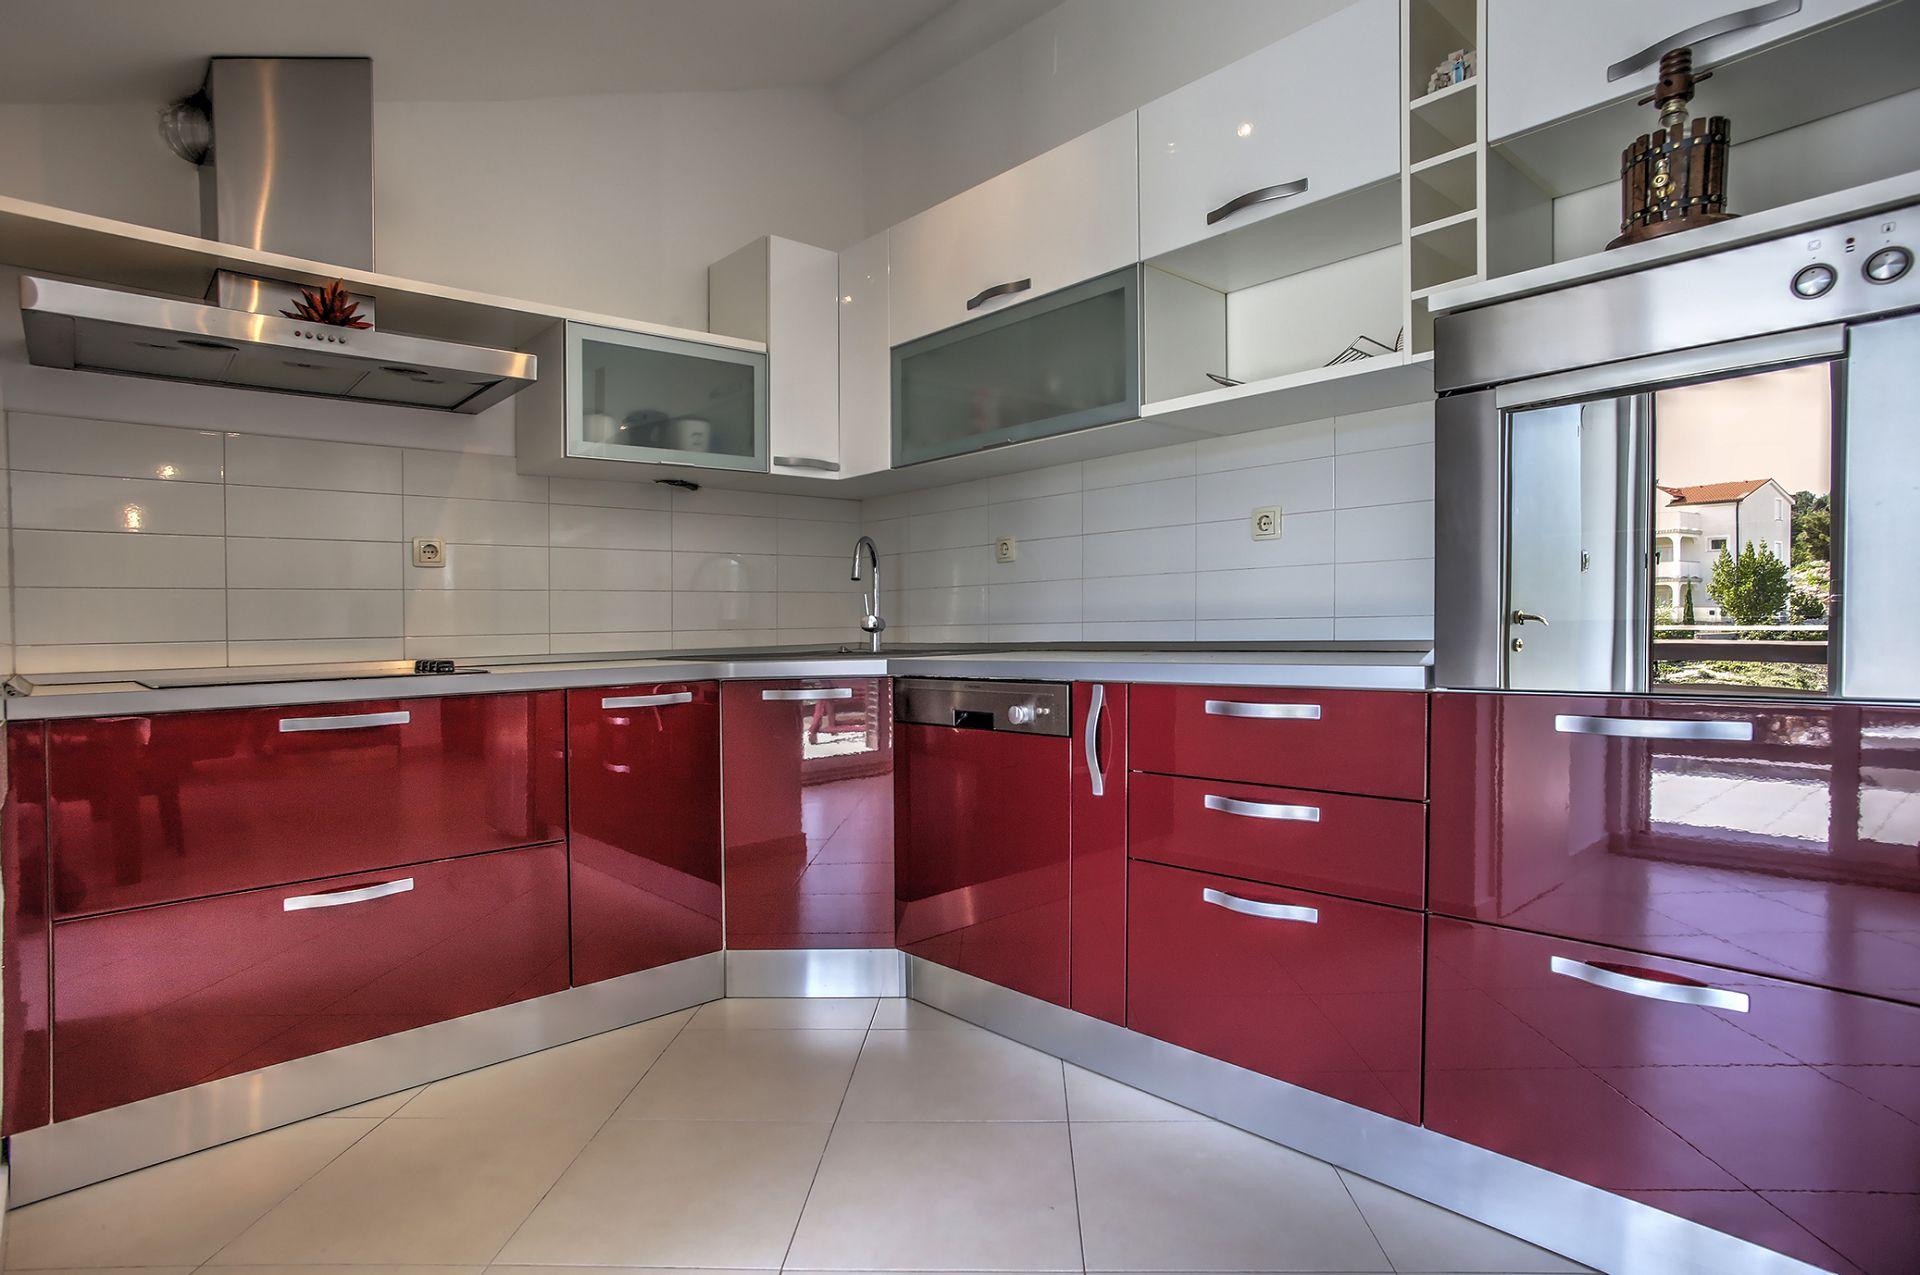 5409 - Jezera - Apartments Croatia - A5(4): kitchen